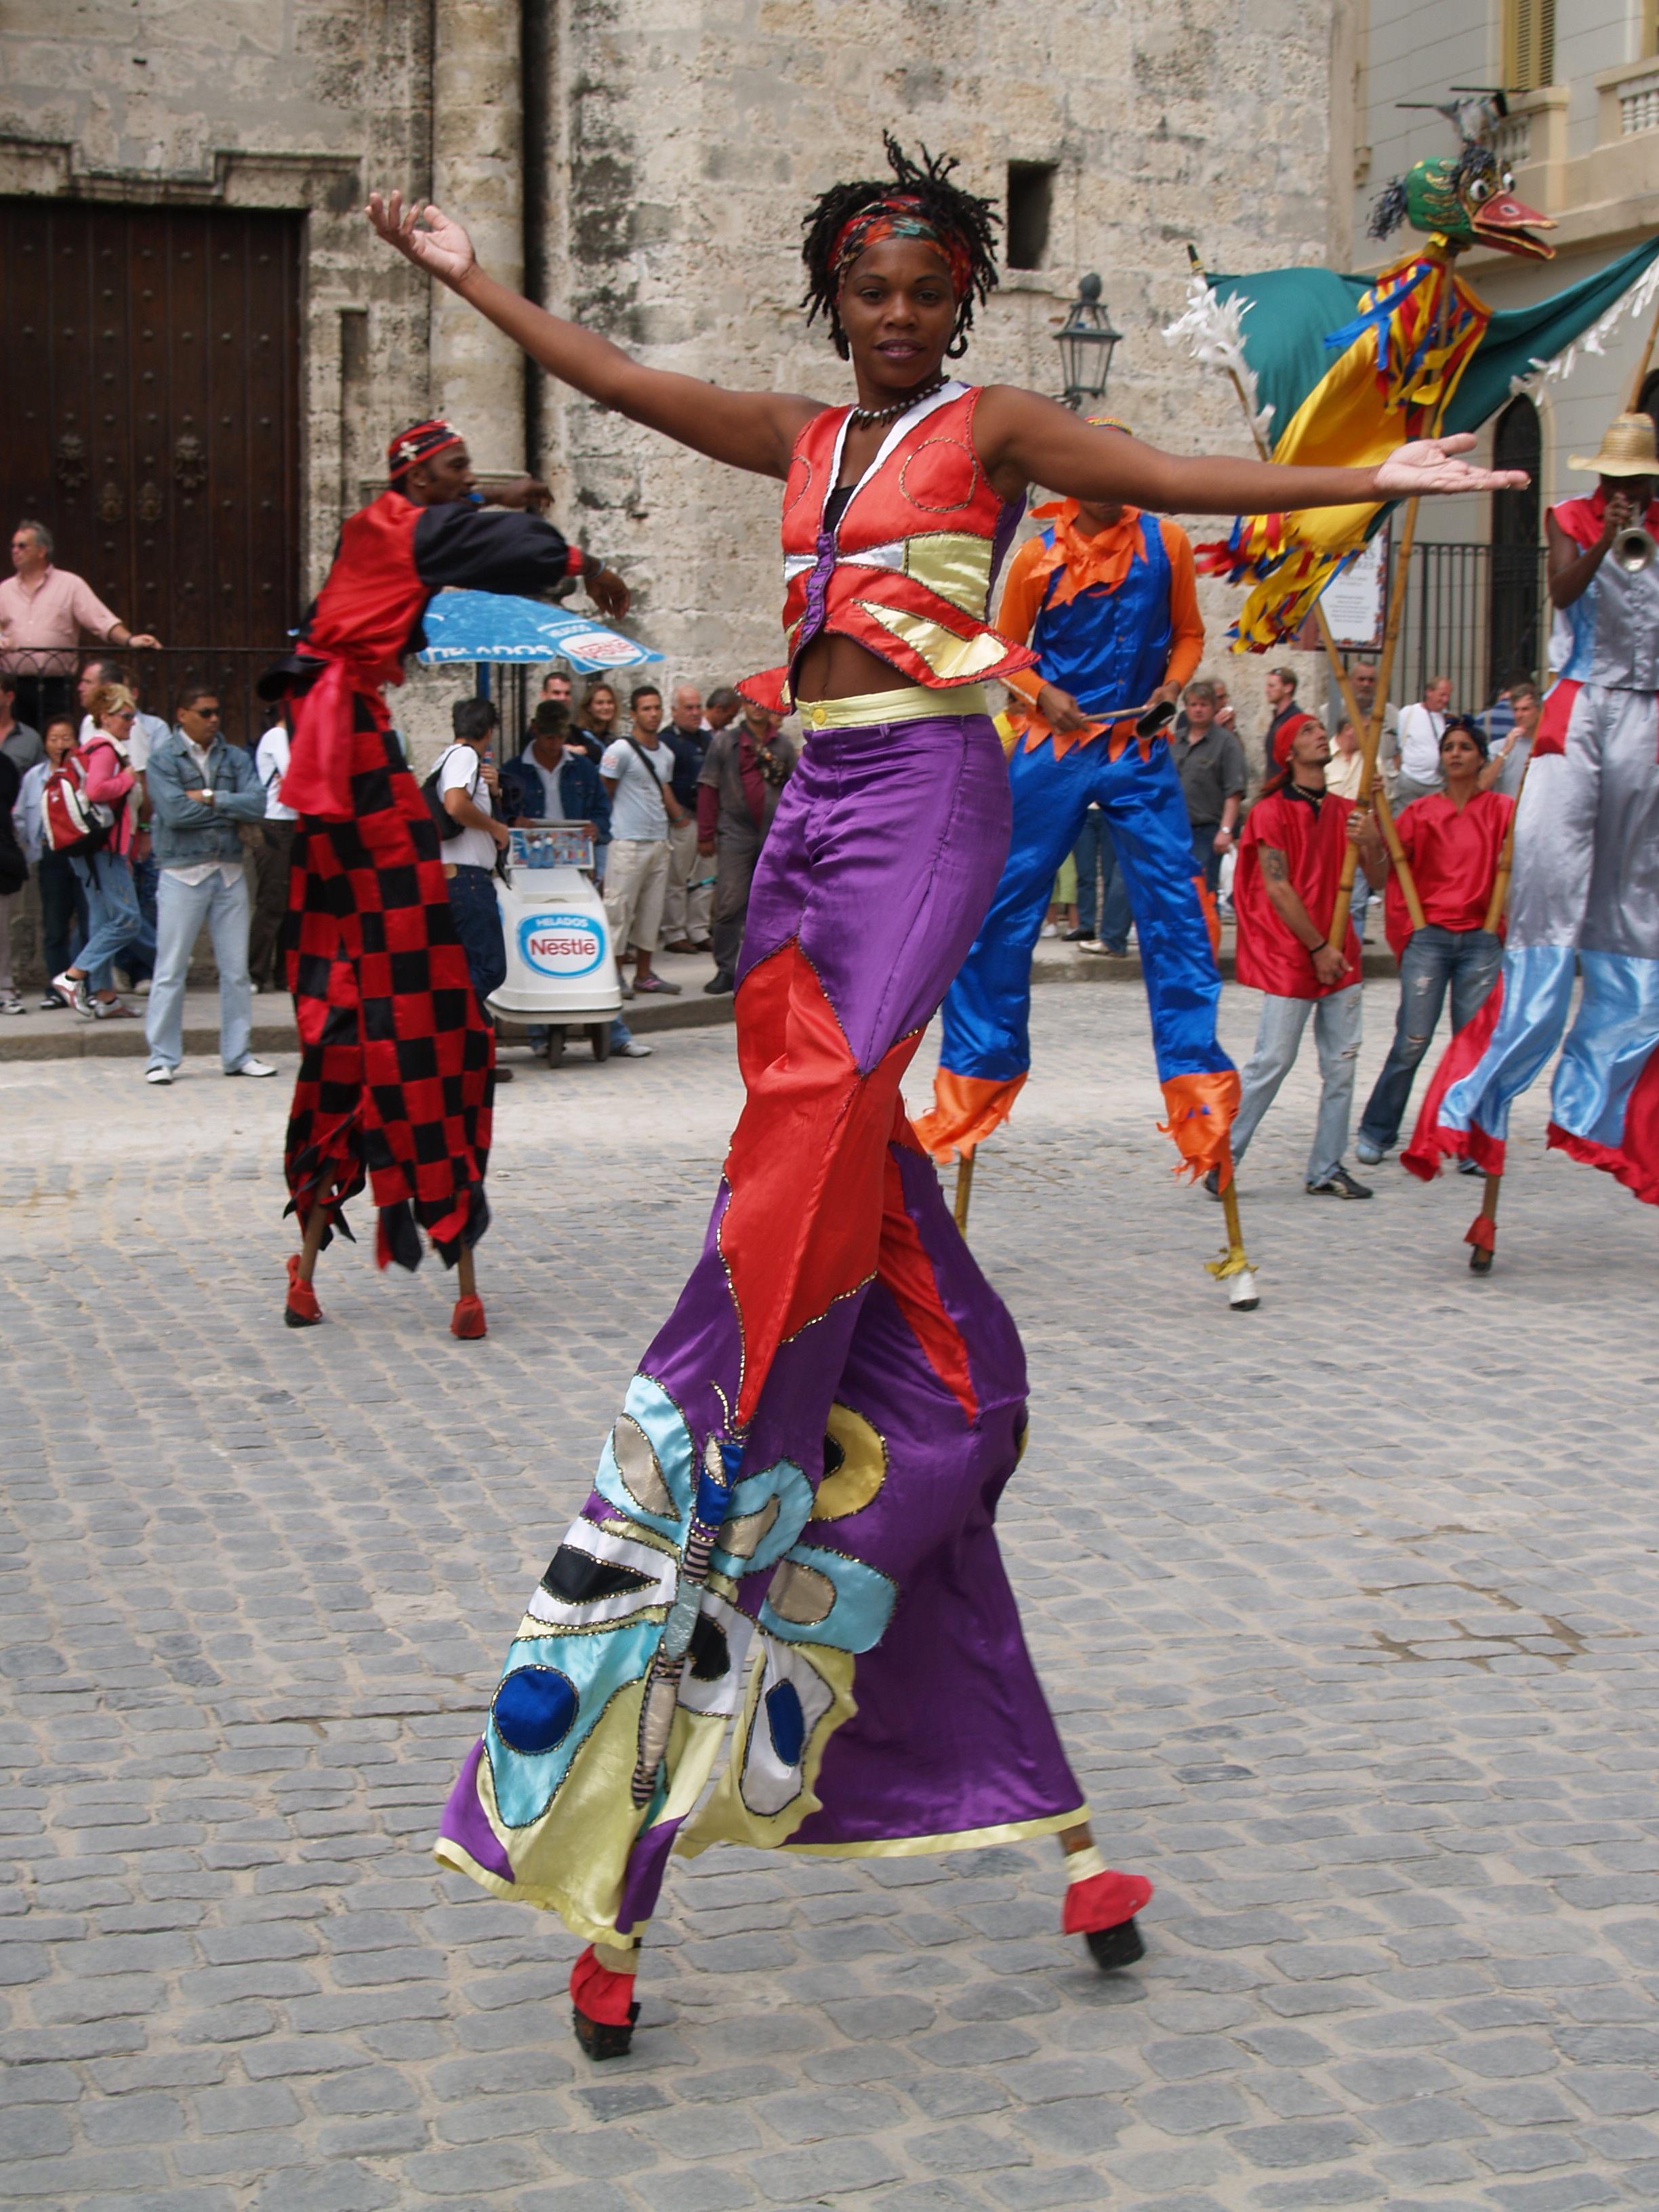 кубинский карнавал фото платок можно